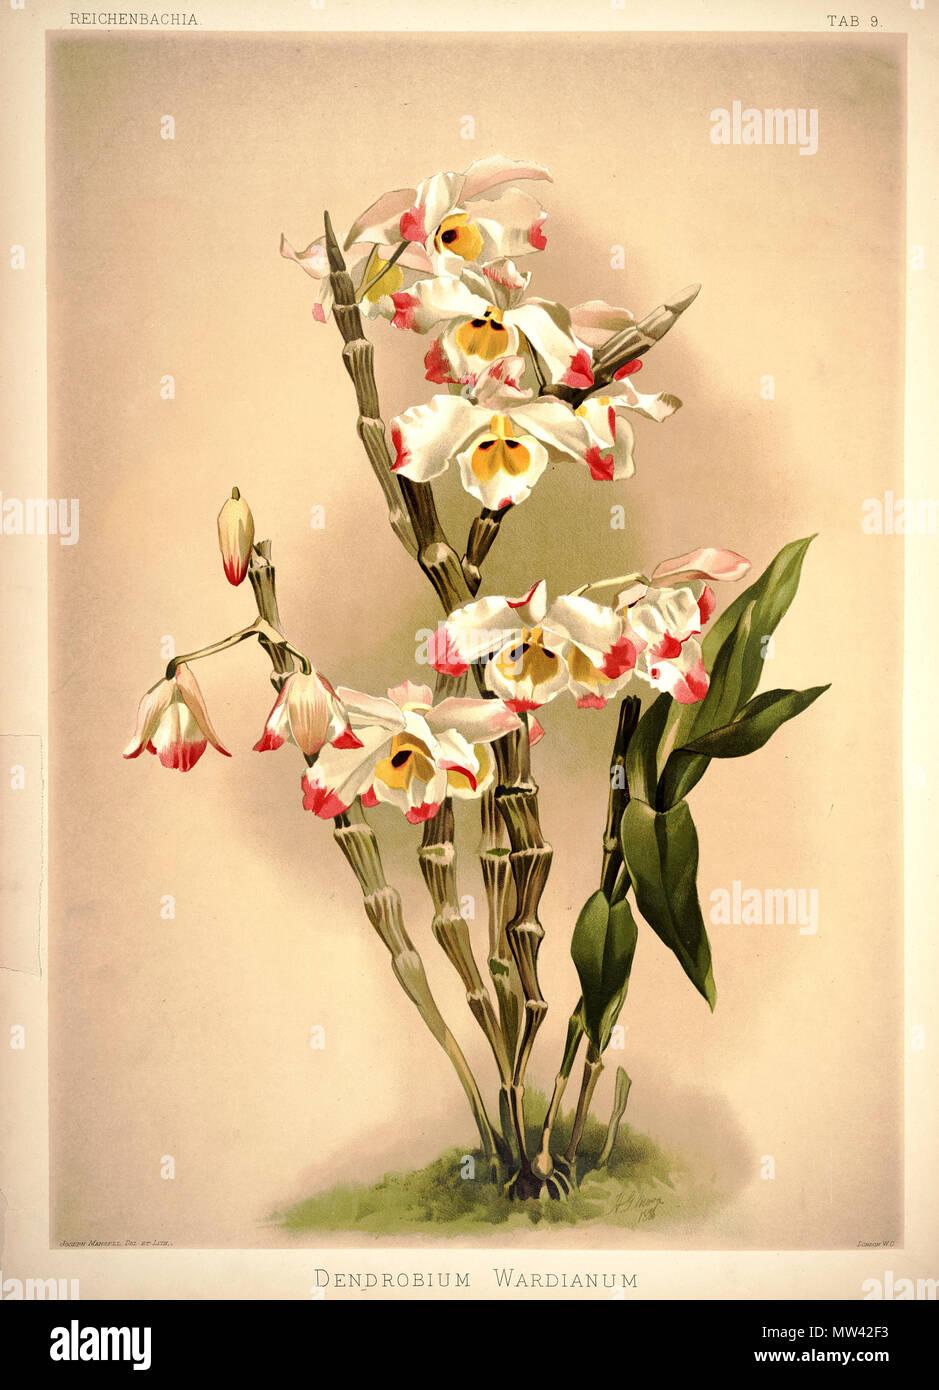 Dendrobium wardianum between 1888 and 1894 h sotheran co h sotheran co london editor 219 frederick sander reichenbachia i plate 09 1888 dendrobium wardianum izmirmasajfo